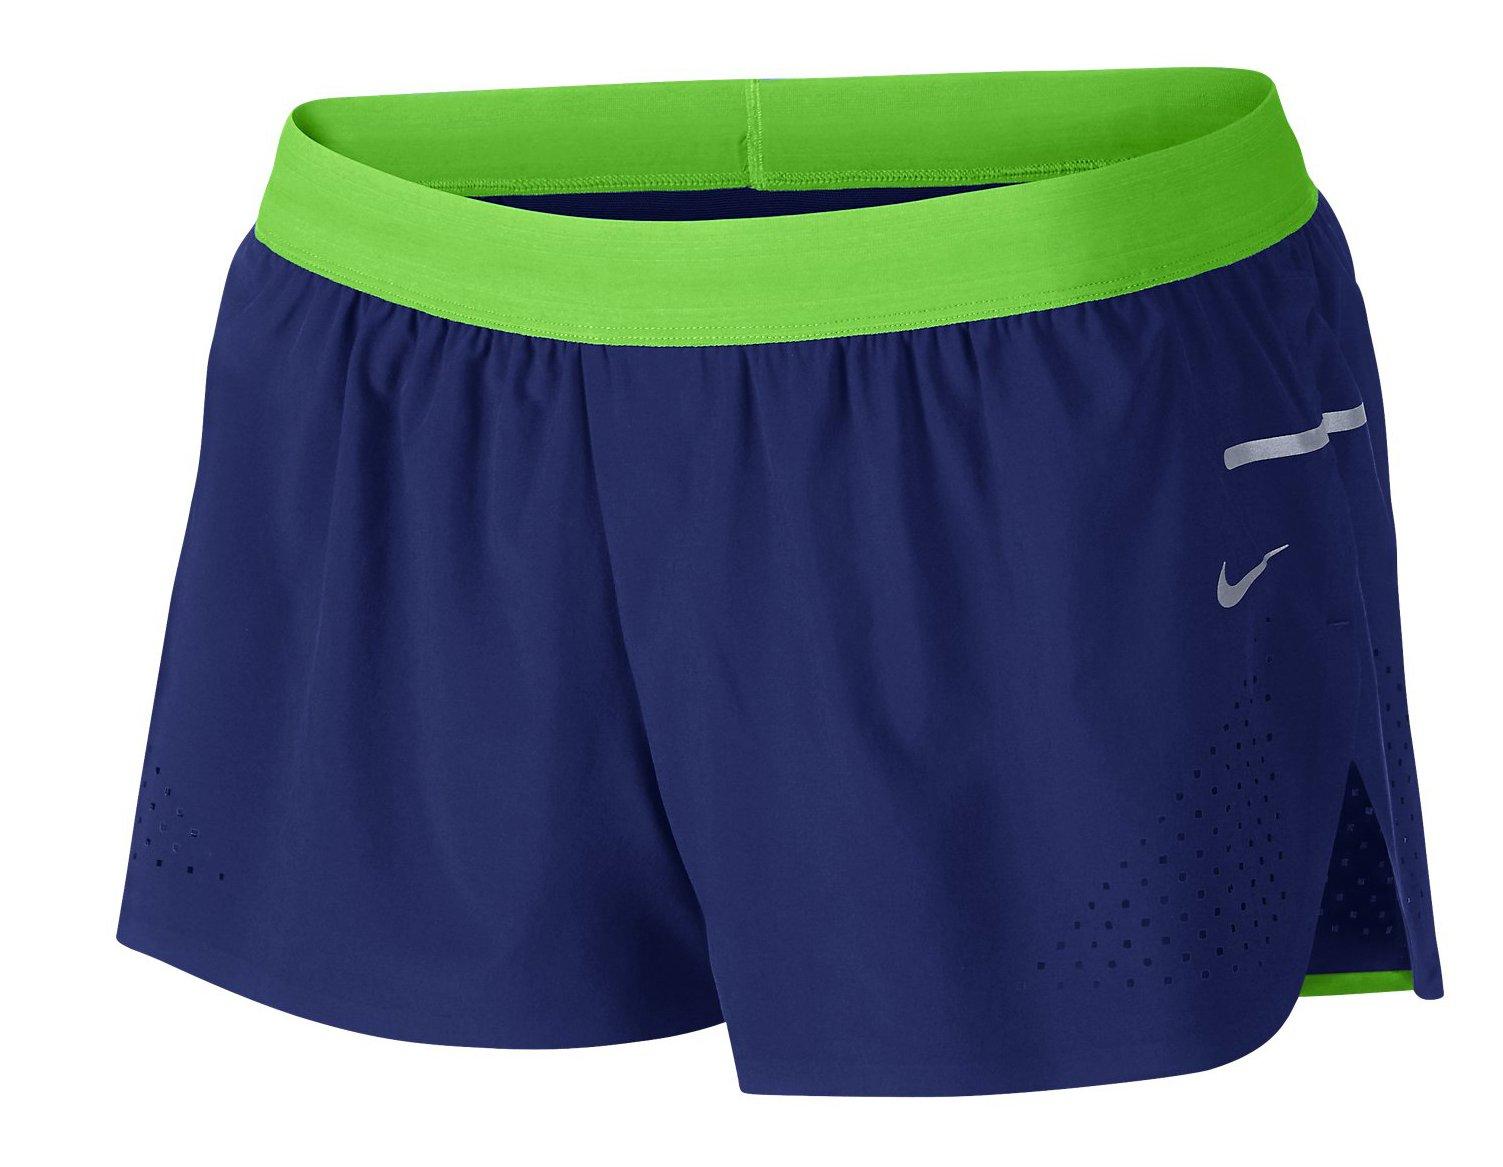 Šortky Nike RACE WOVEN SHORT